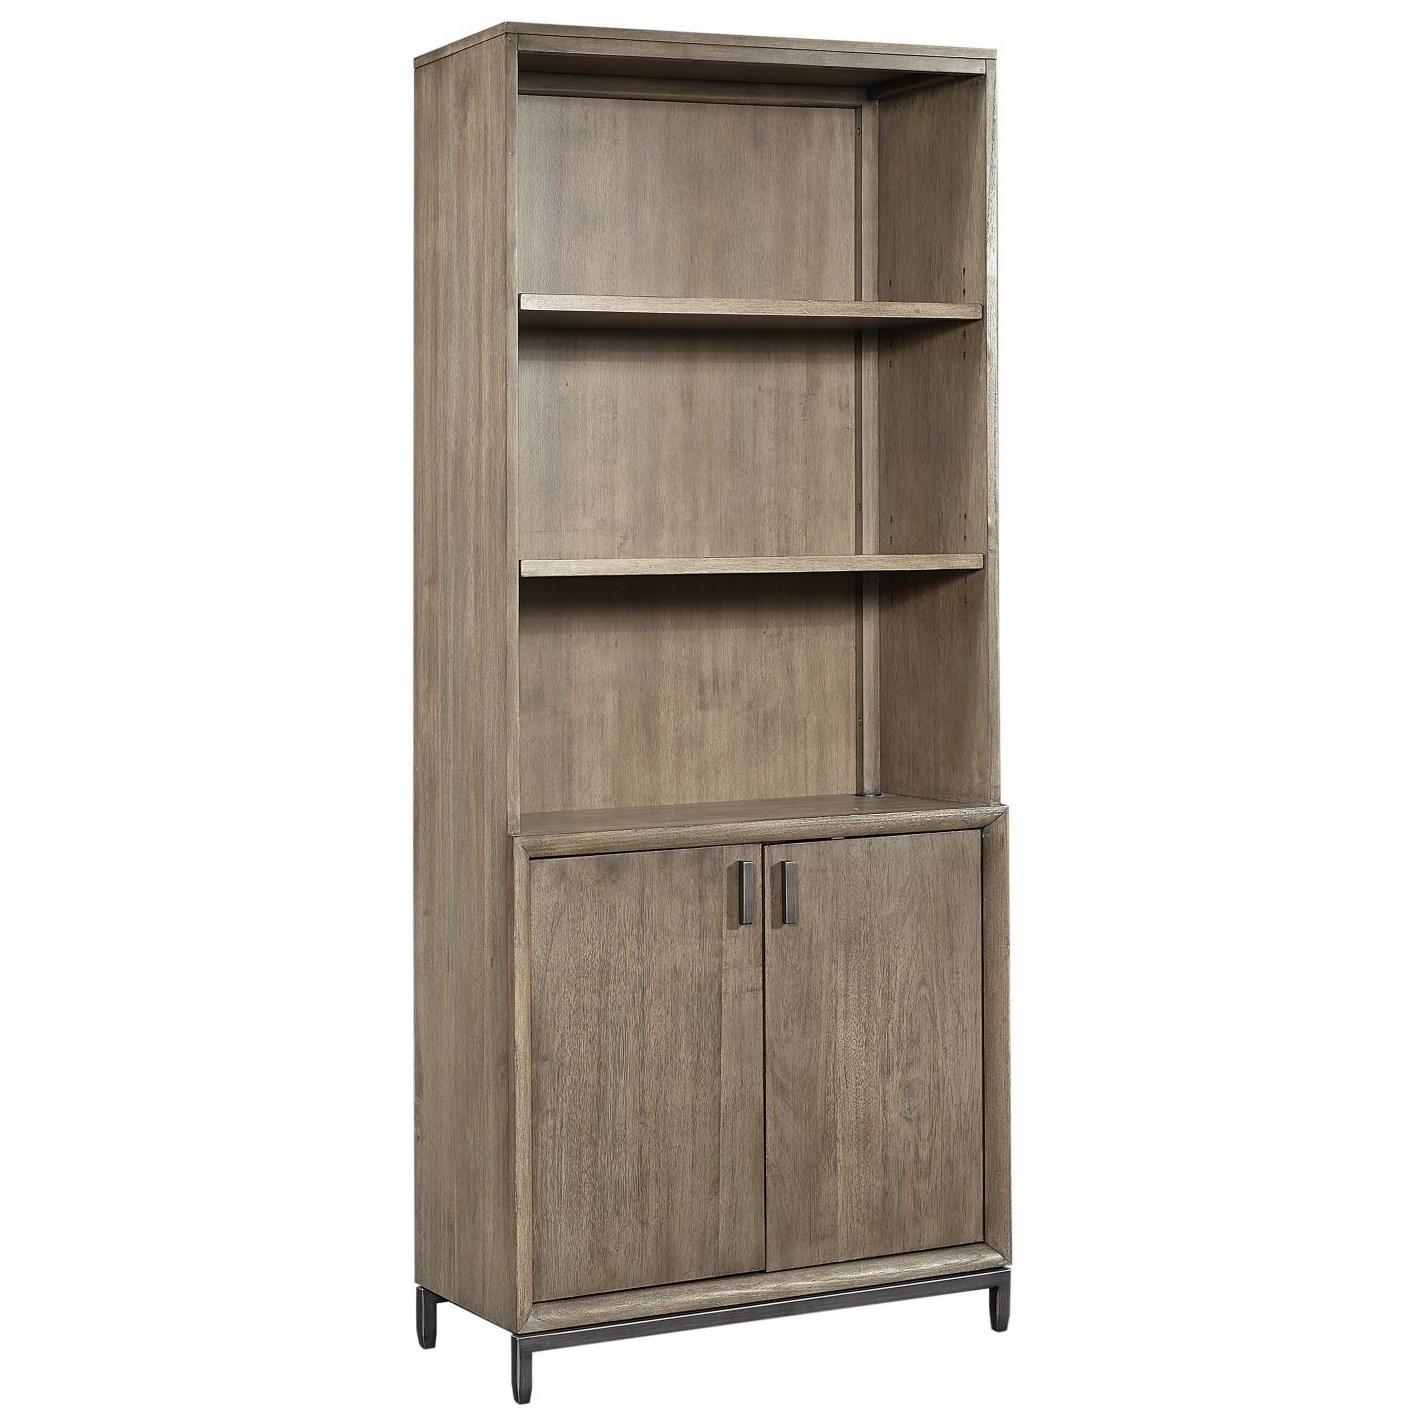 Trellis Door Bookcase by Aspenhome at Baer's Furniture